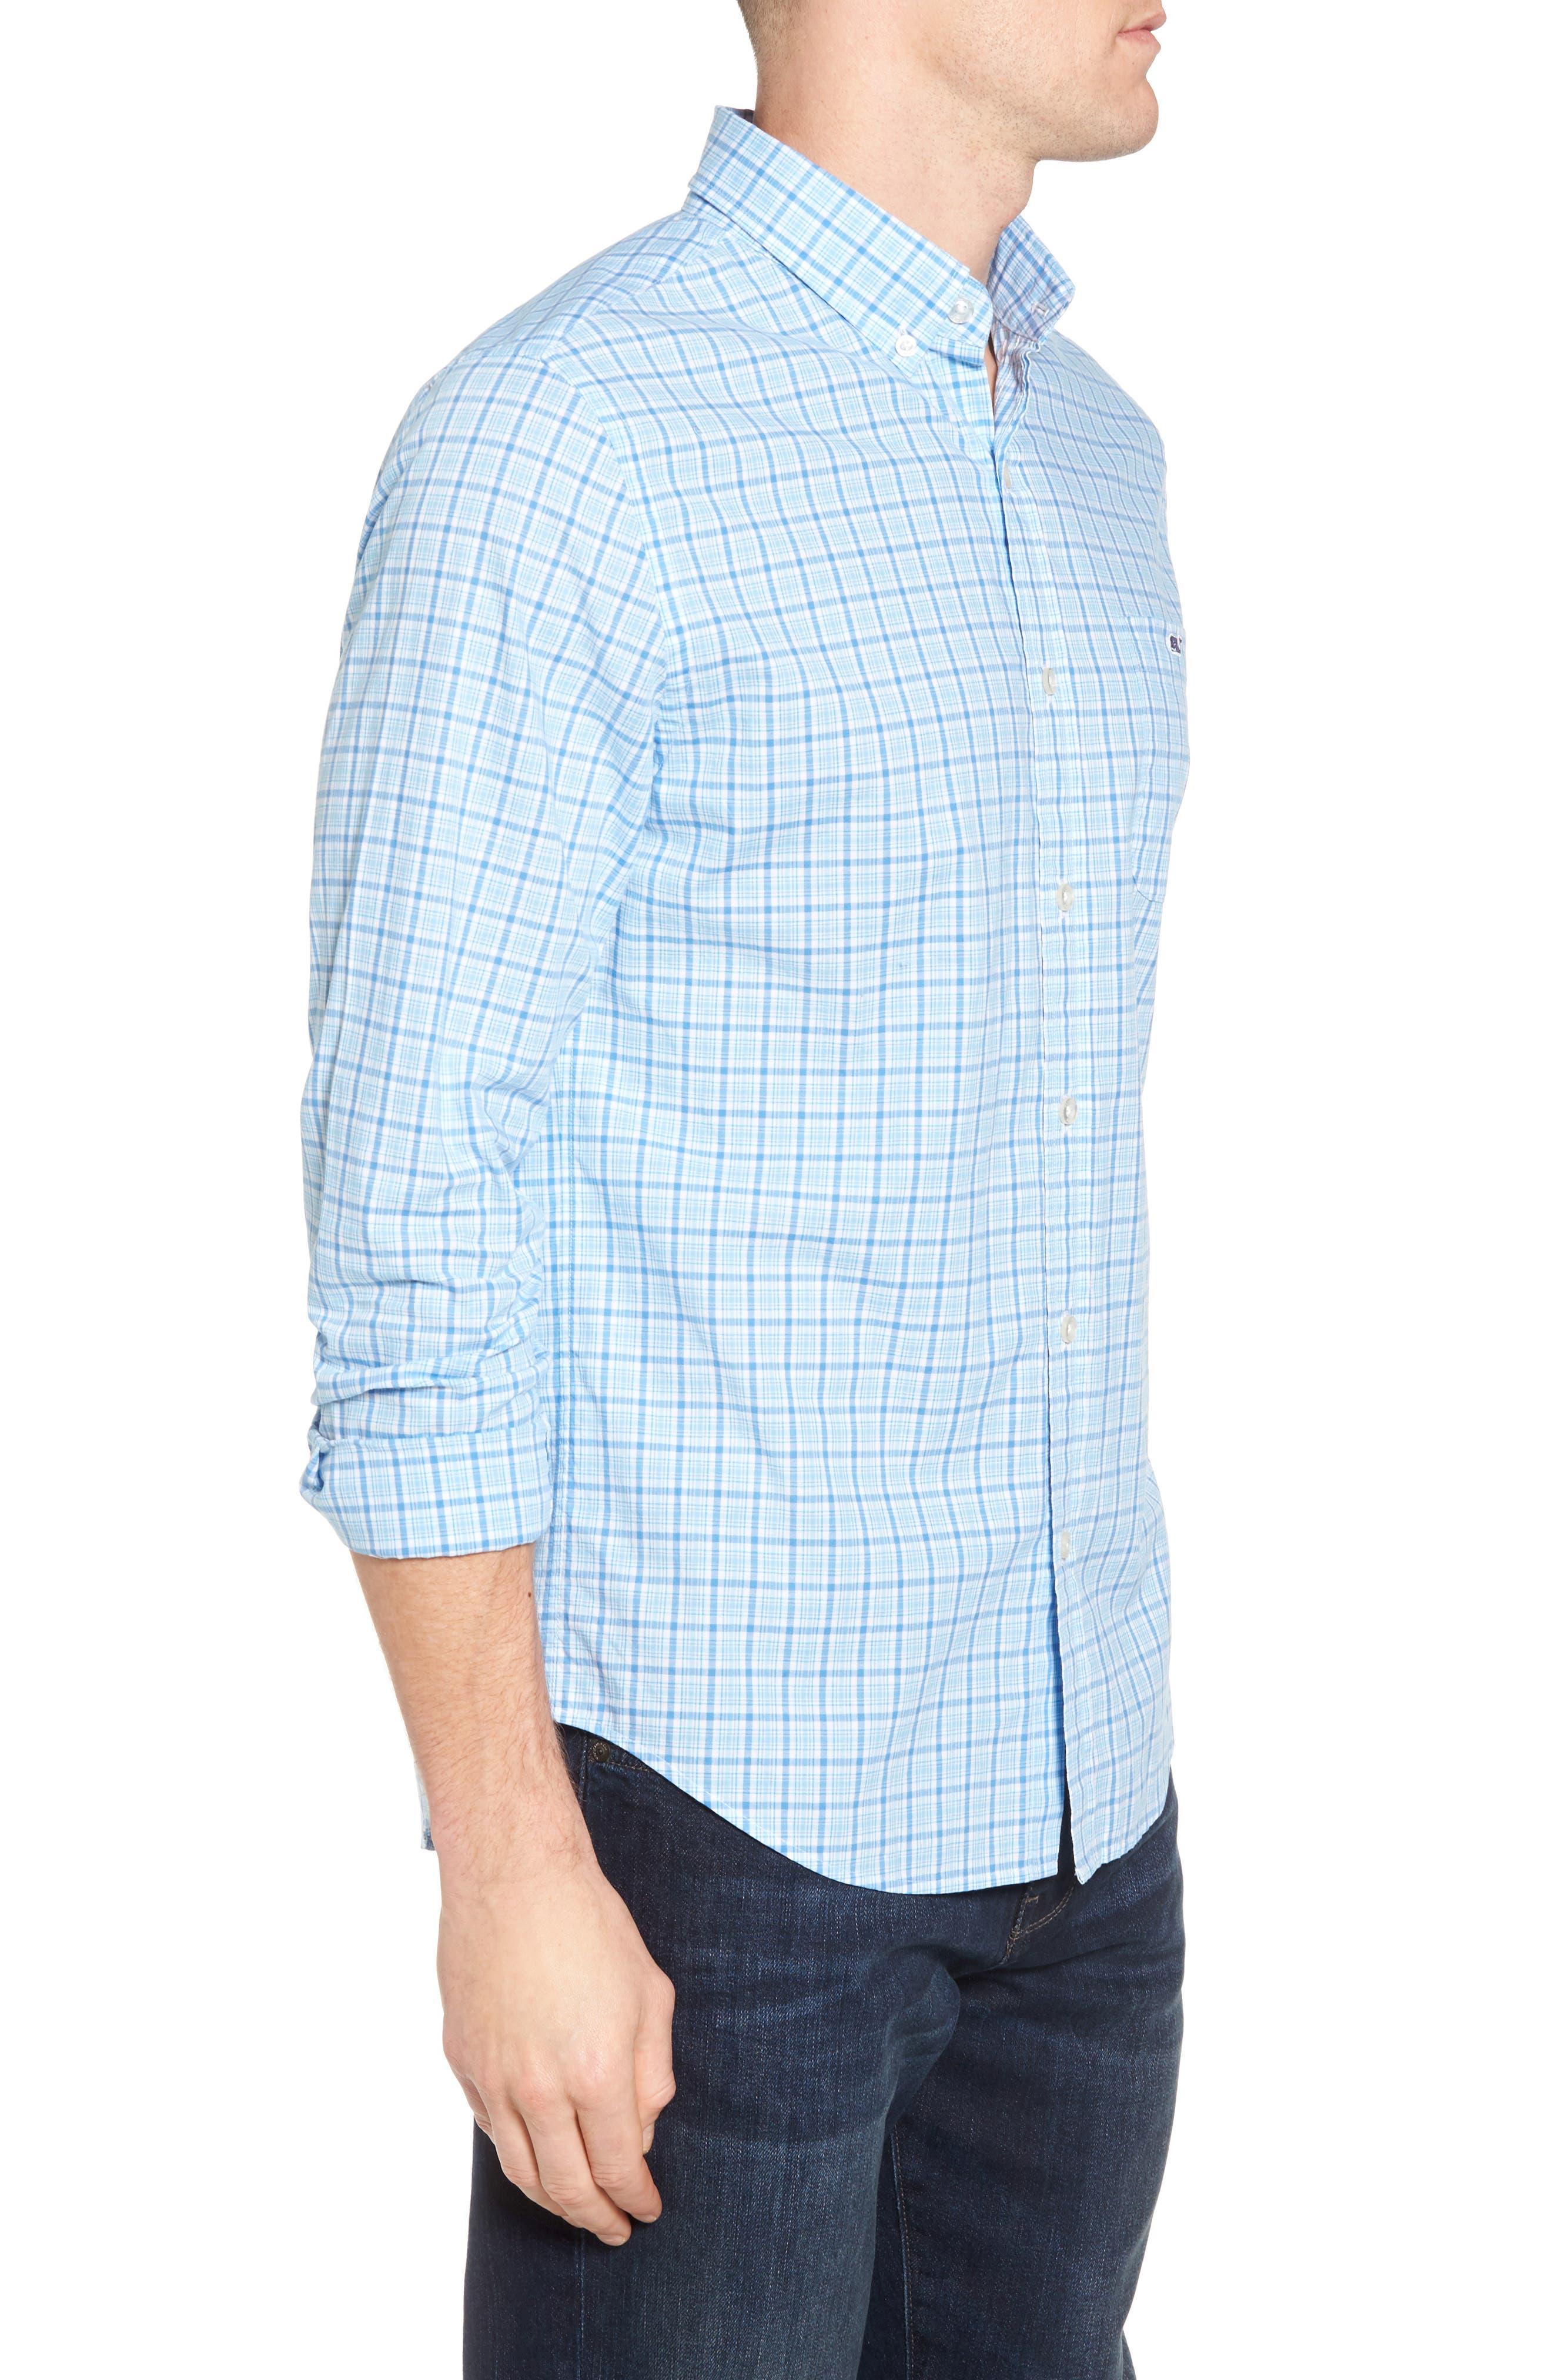 Alternate Image 3  - vineyard vines Seawatch Slim Fit Plaid Sport Shirt